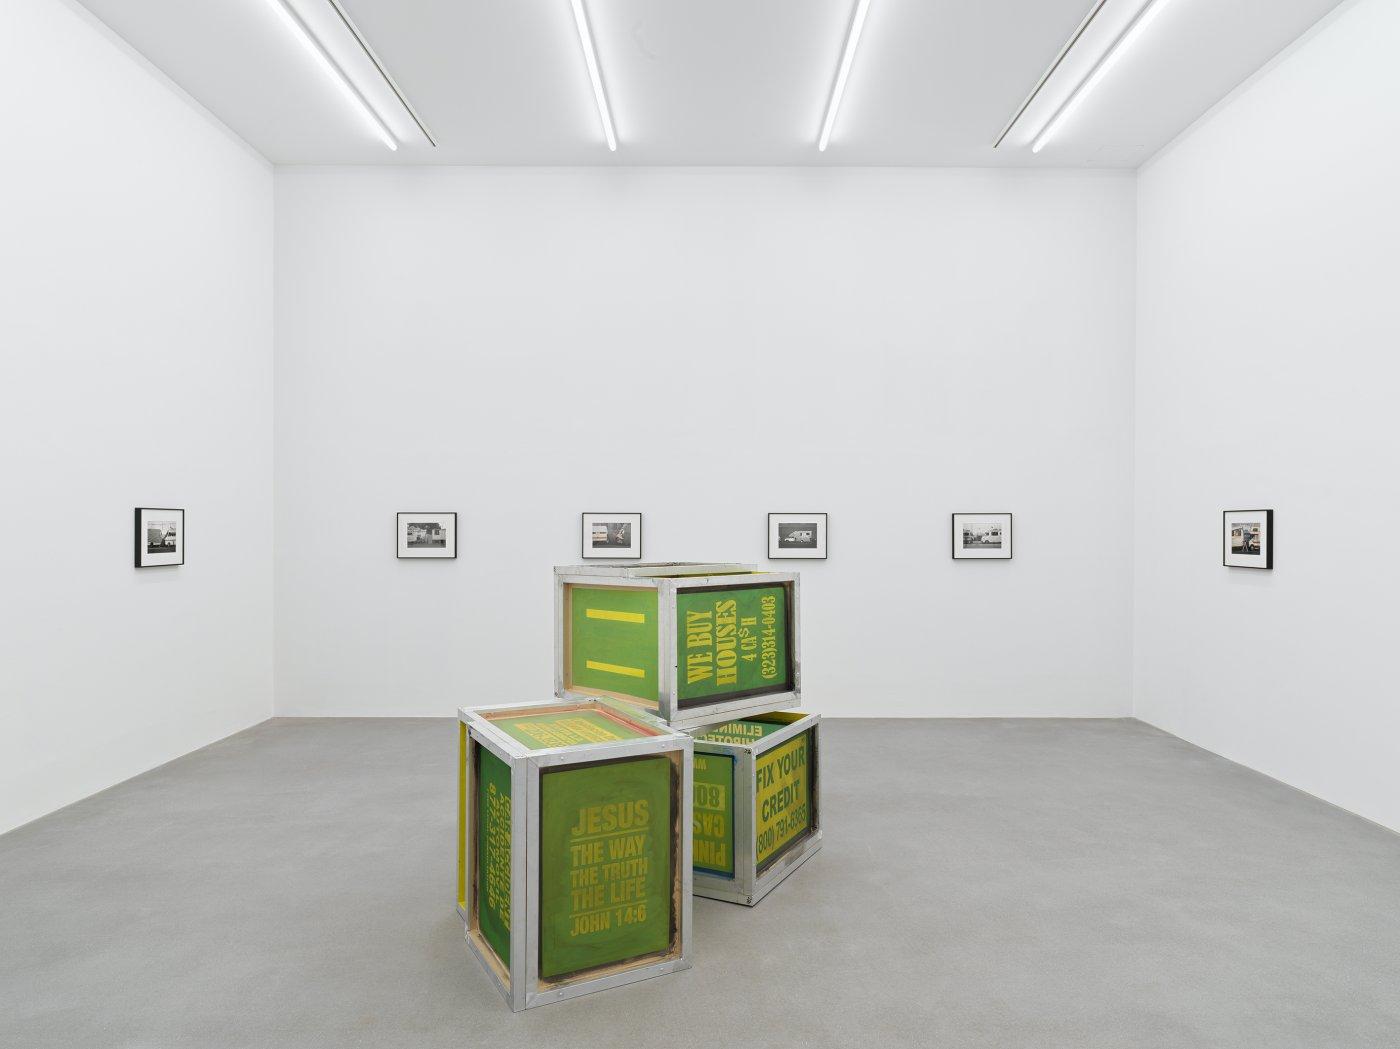 Galerie Eva Presenhuber Waldmanstrasse Walead Beshty 8